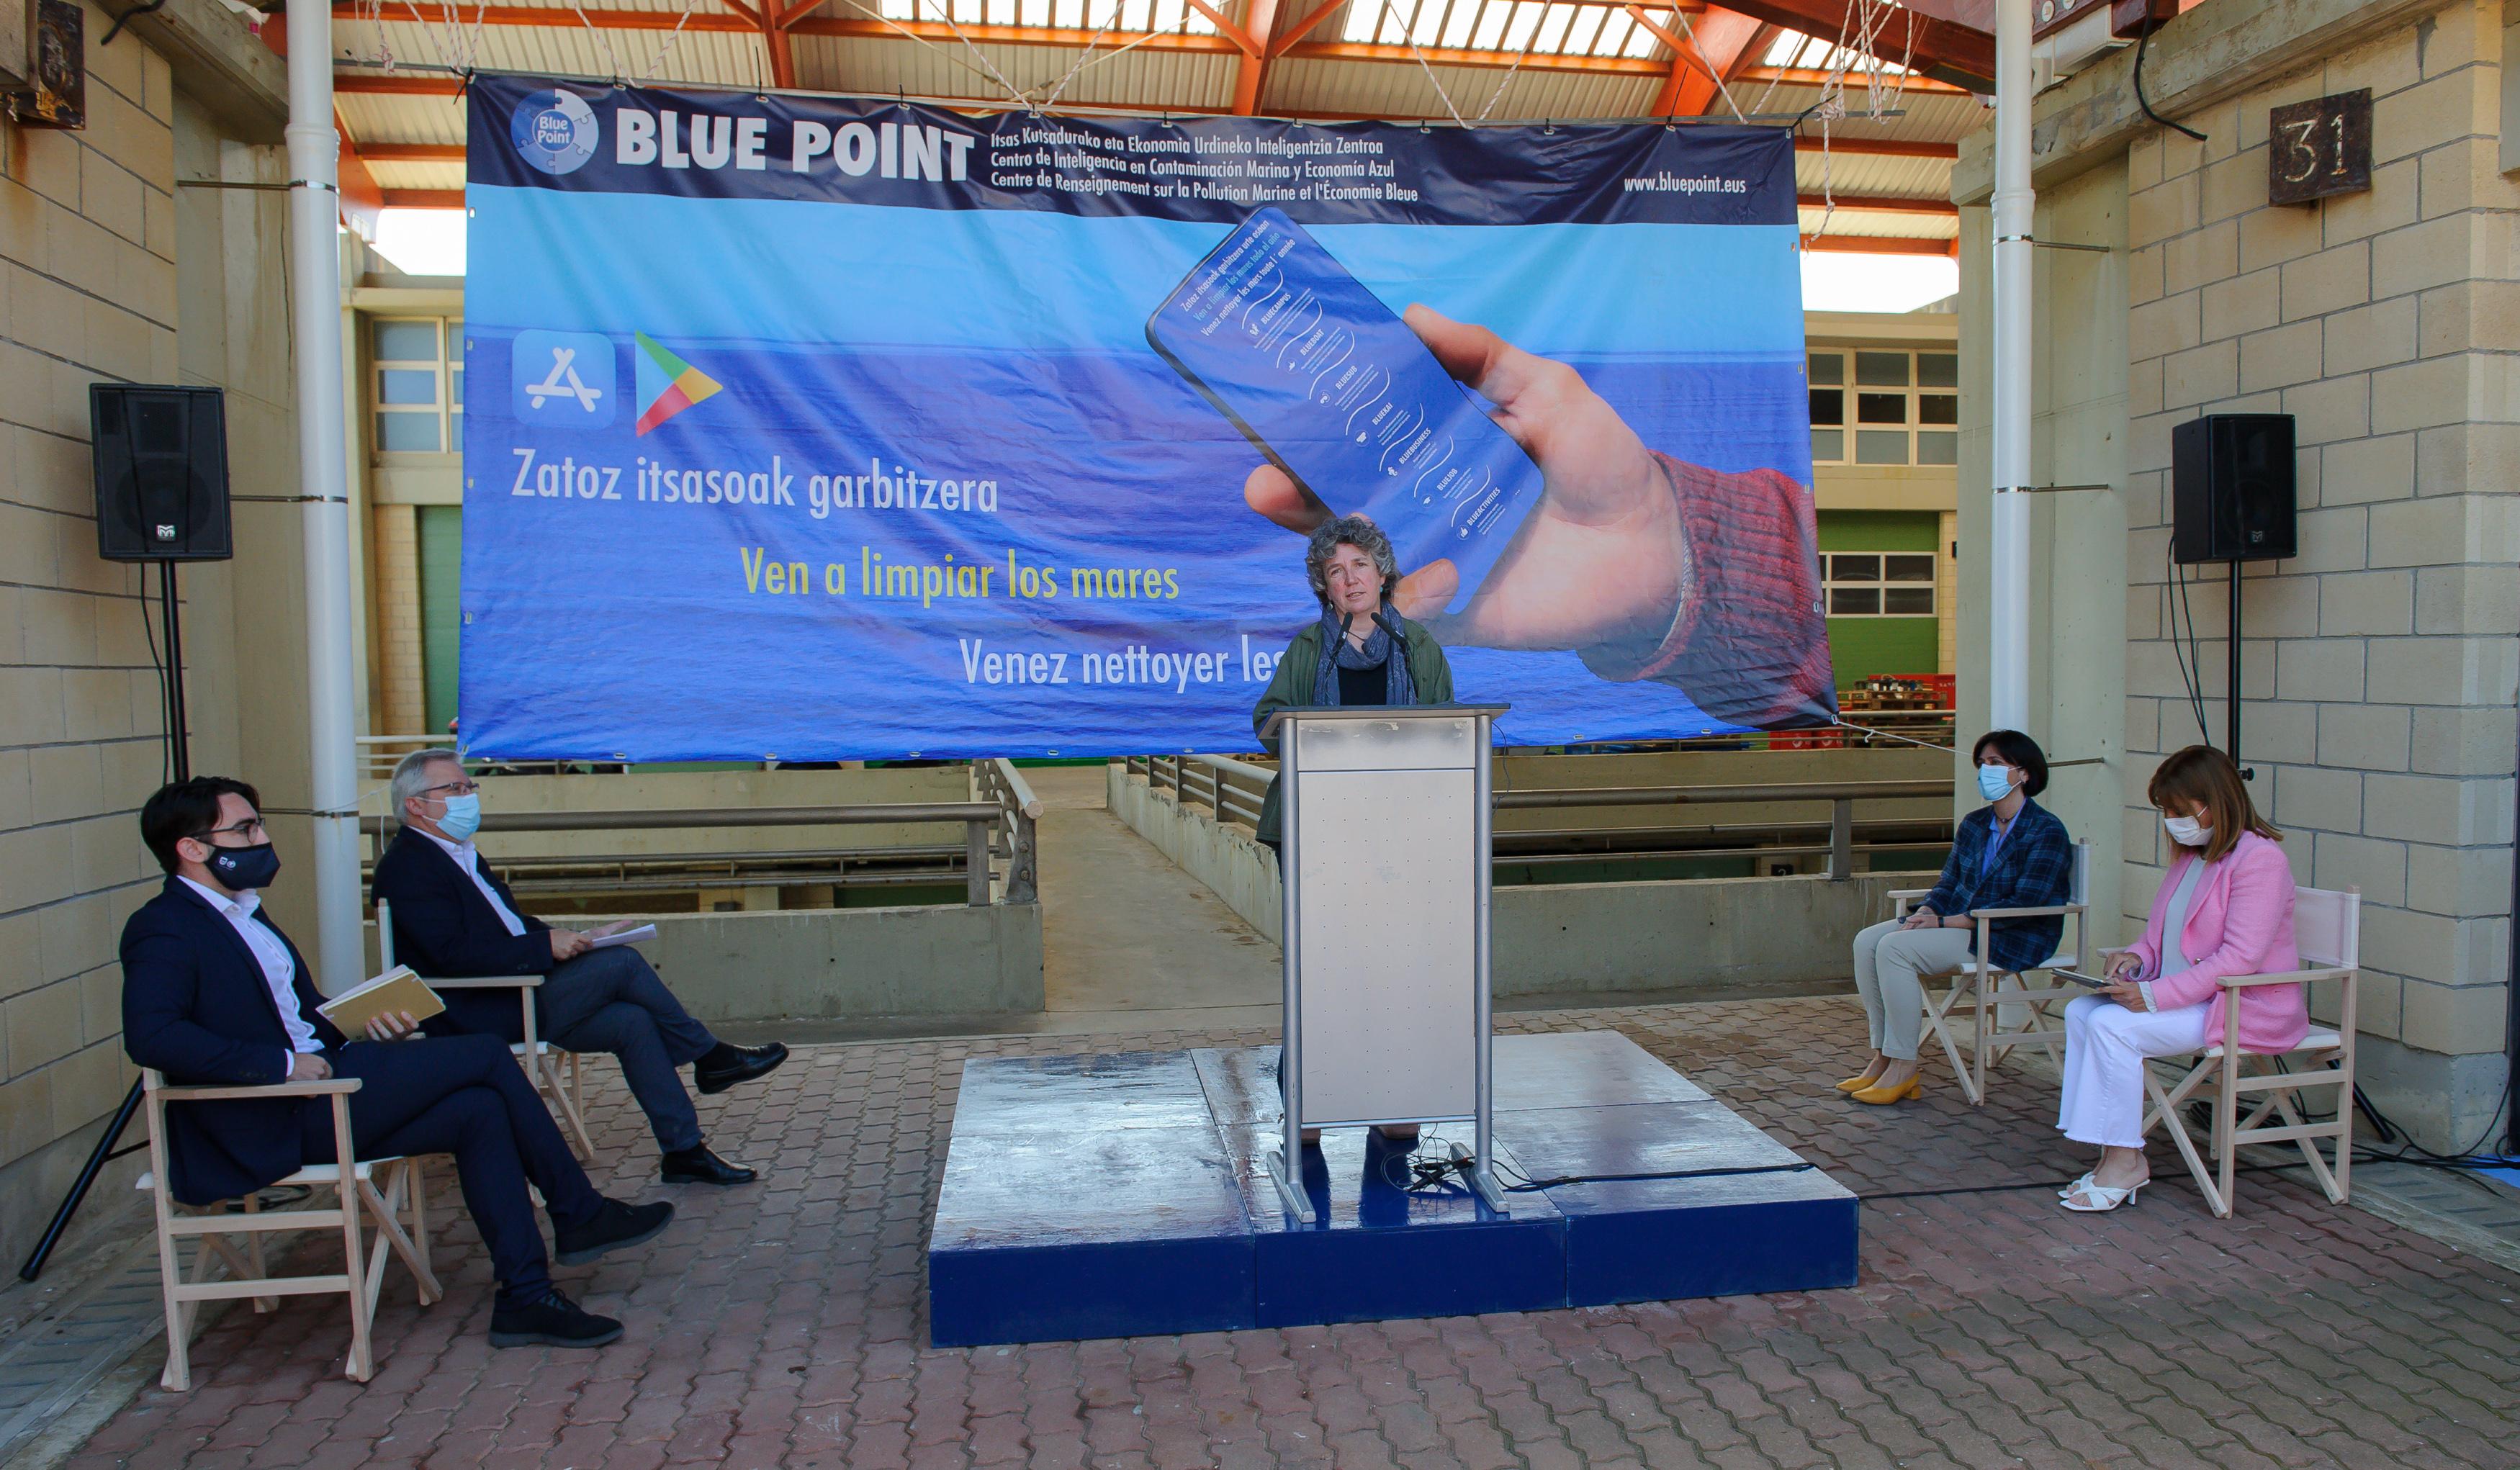 20210607-BARREDO-BLUE_POINT-110.jpg